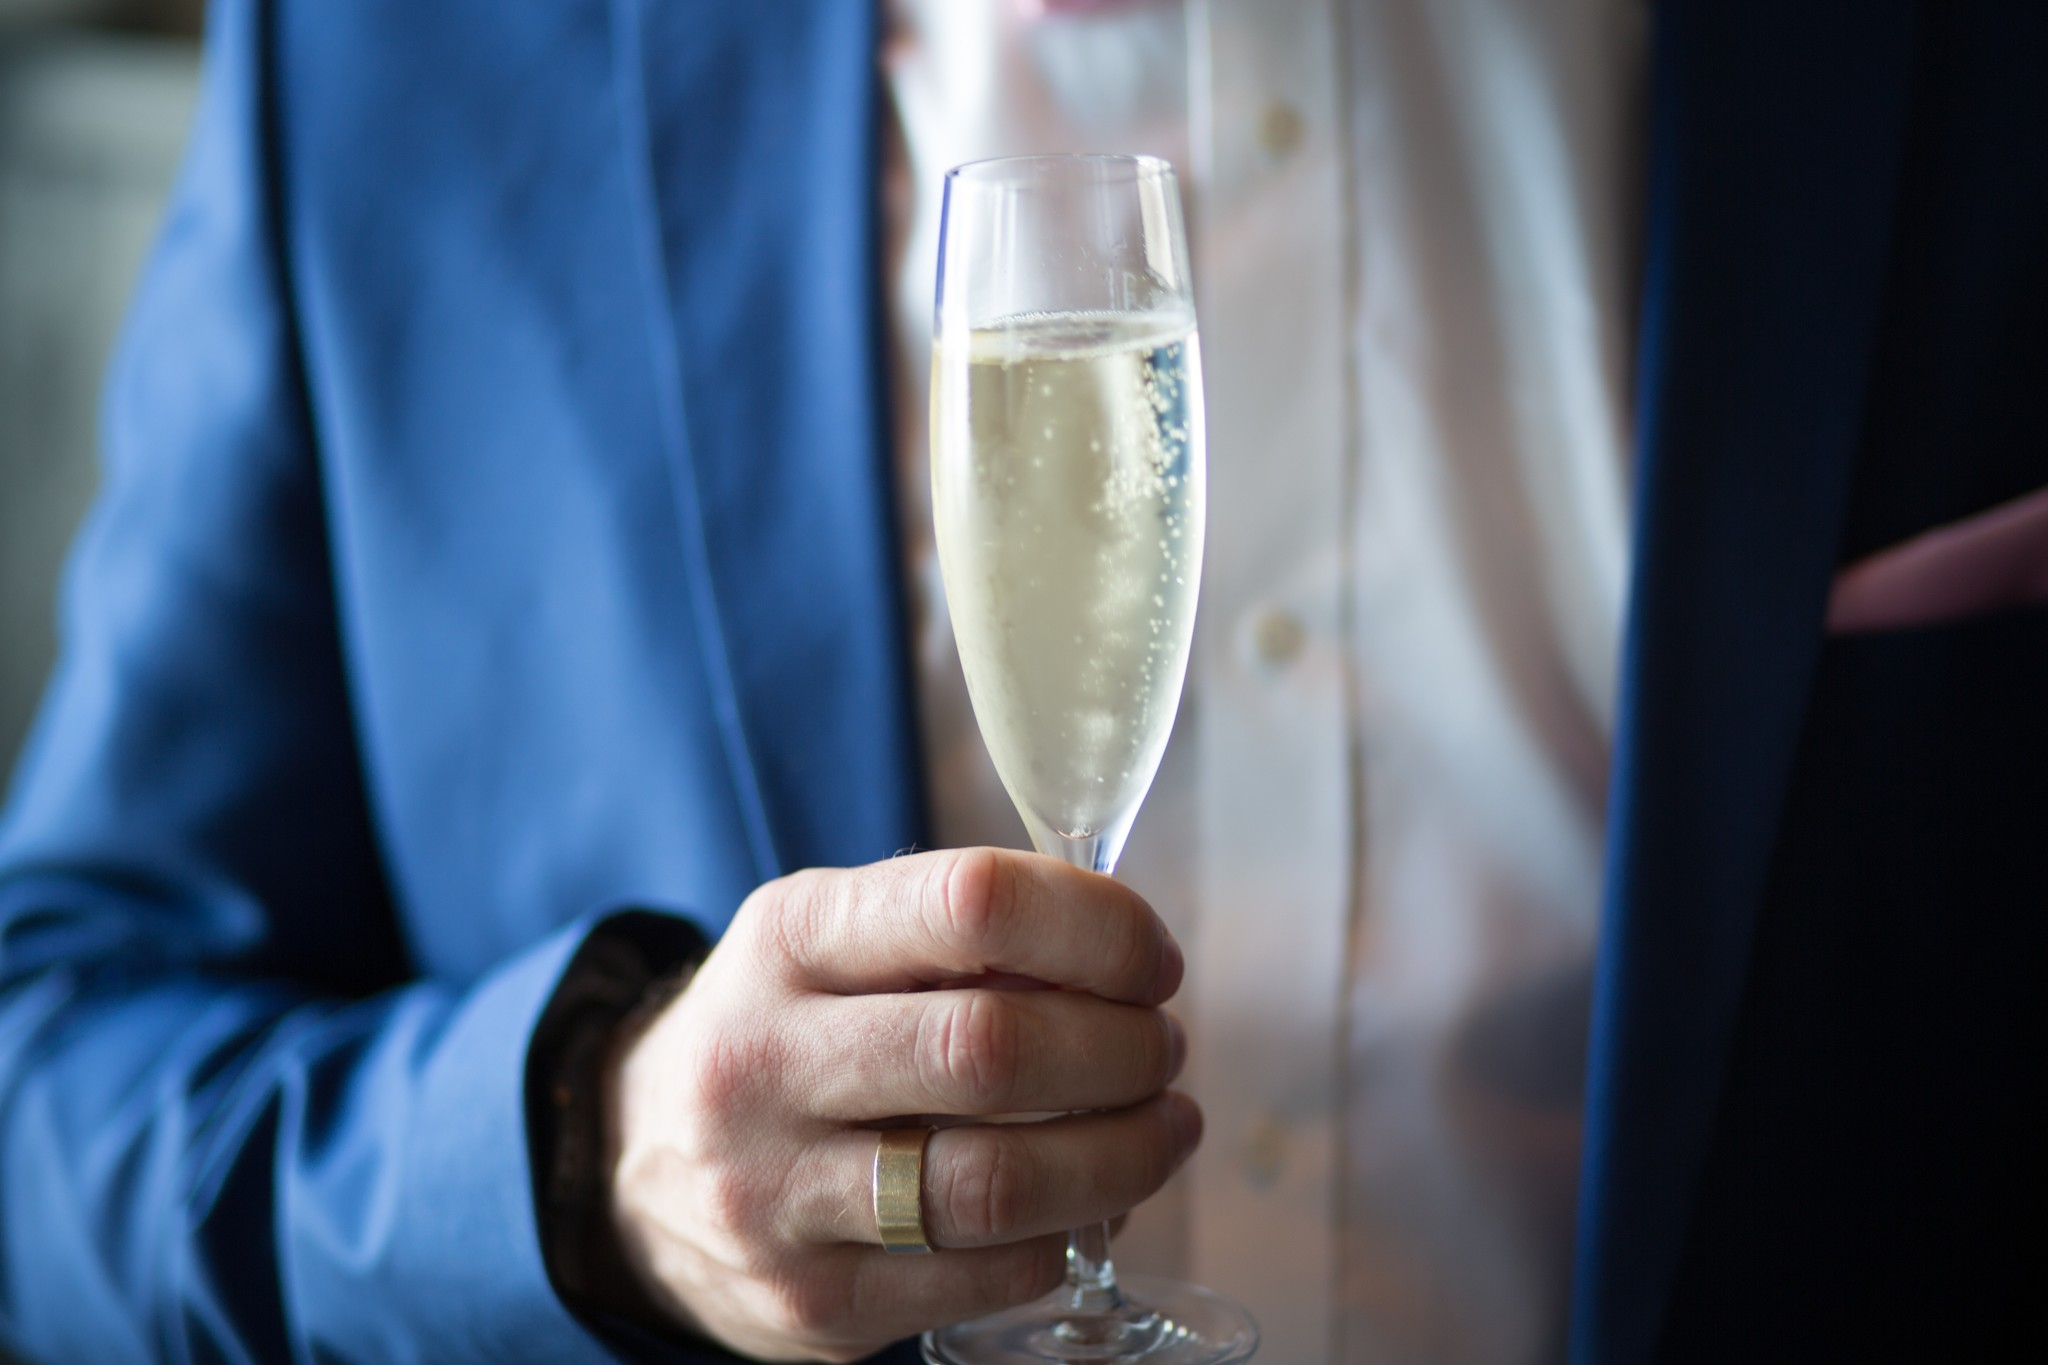 Wat is de juiste manier op champagne te openen en te serveren?